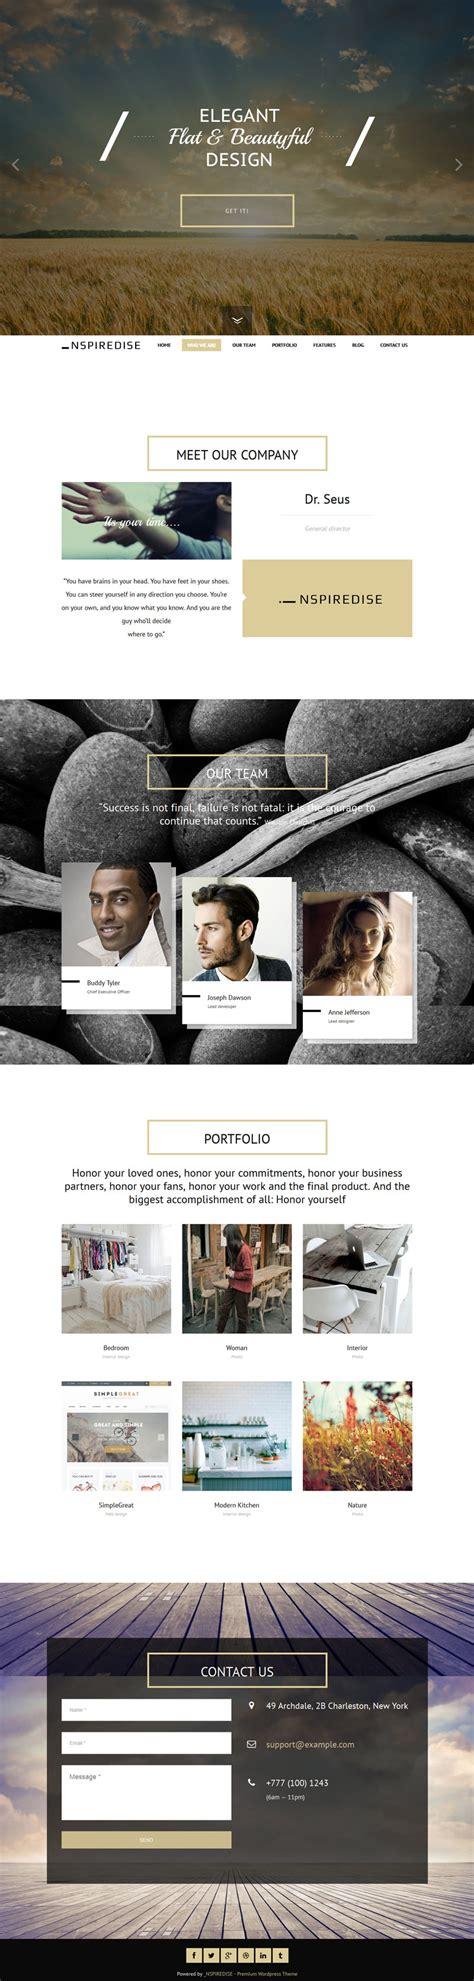 html parallax themes nspiredise portfolio parallax theme flatdsgnflatdsgn